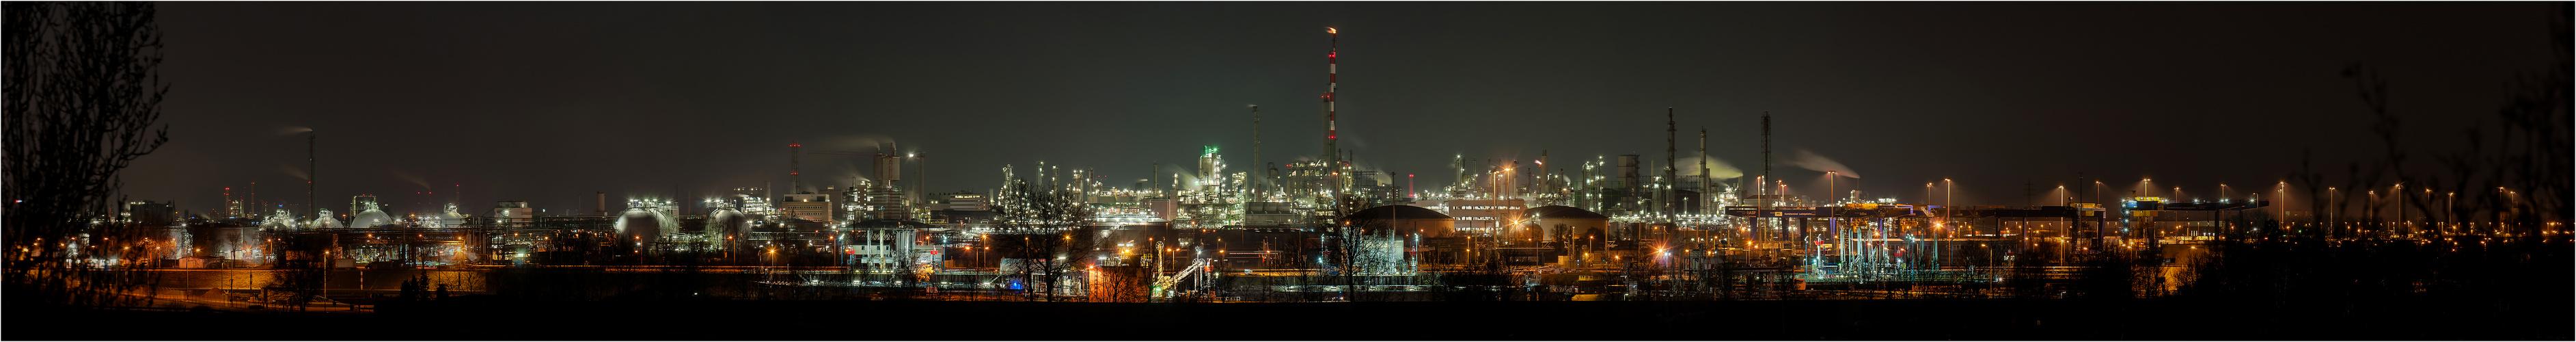 BASF DRI-Panorama